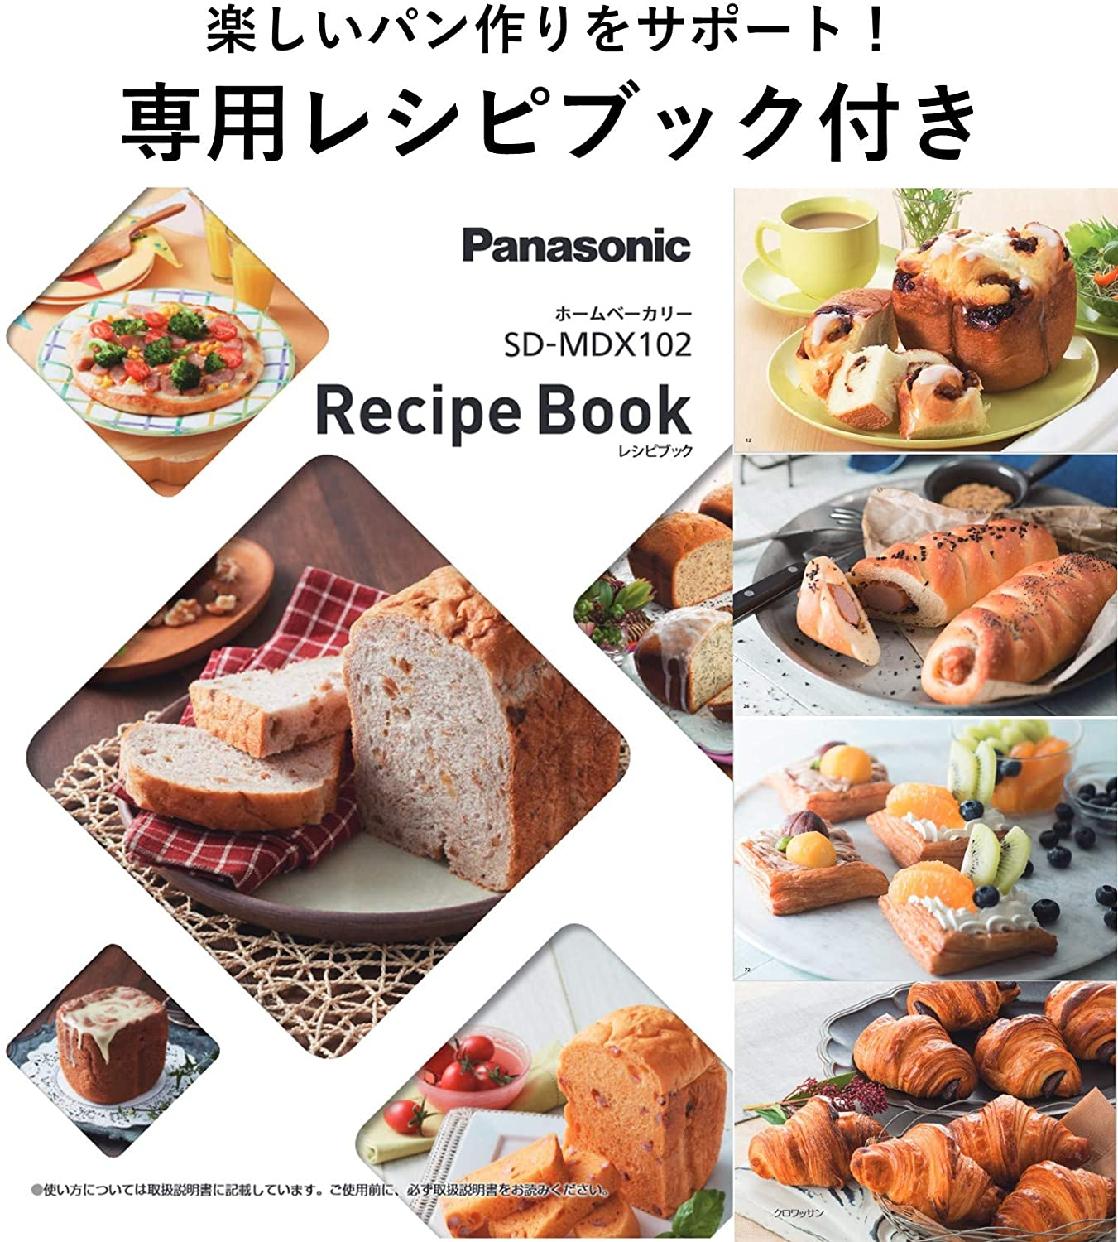 Panasonic(パナソニック)ホームベーカリー SD-MDX102の商品画像6